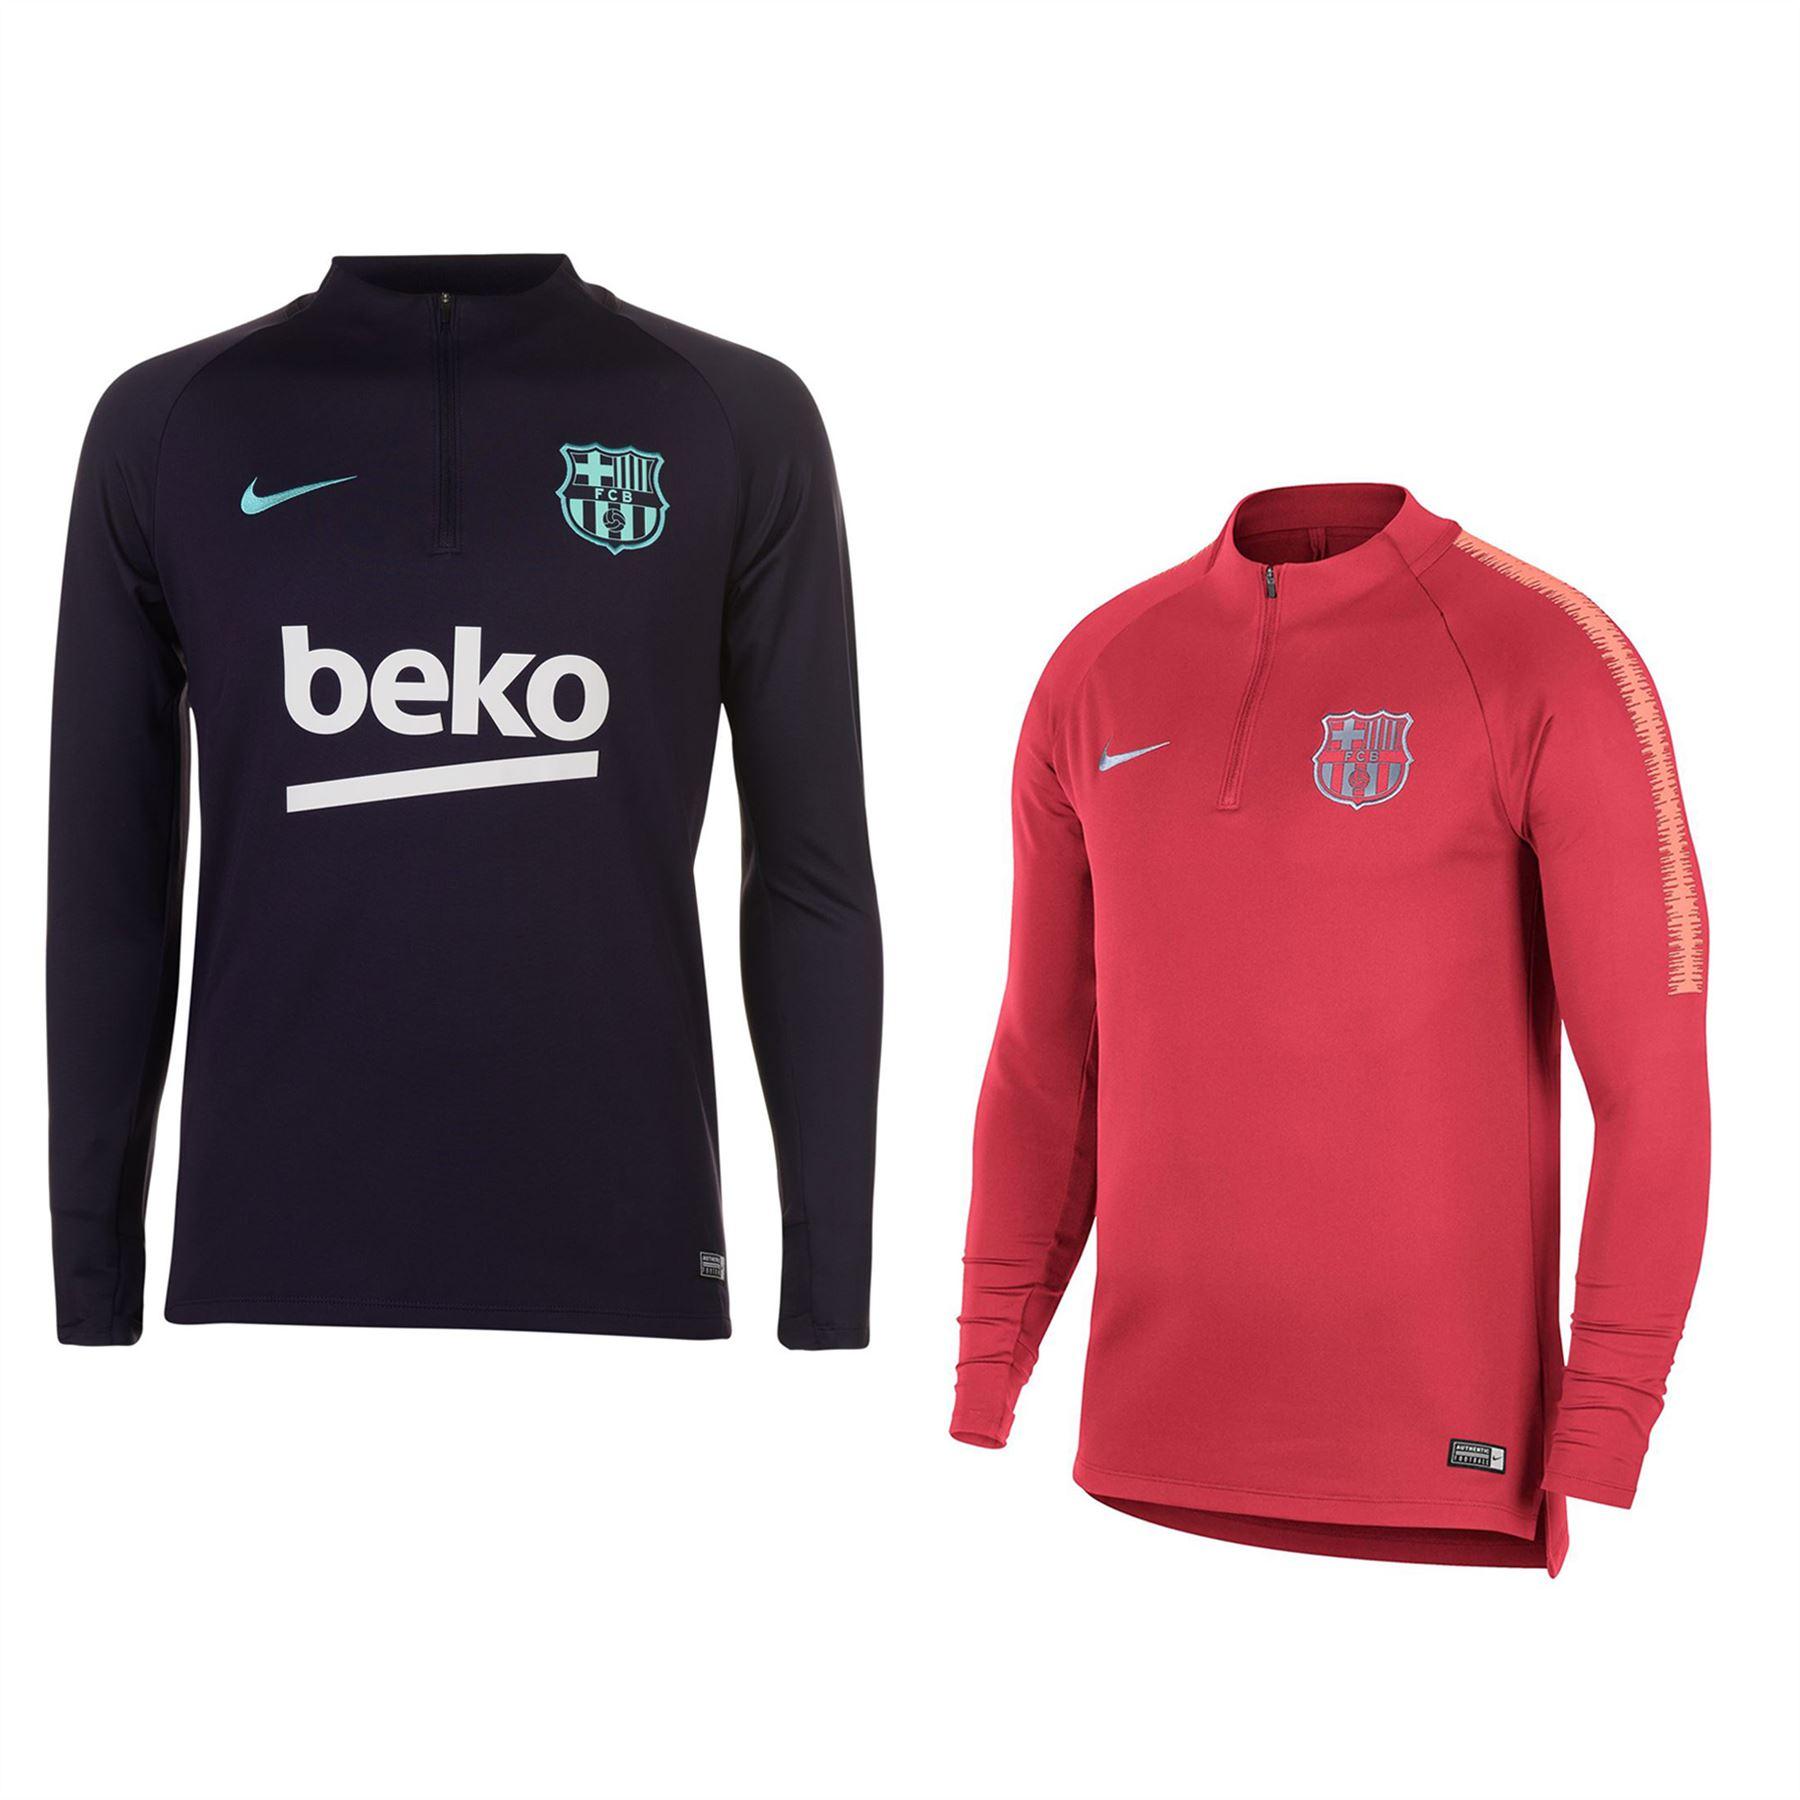 69a8329f2 ... Nike Barcelona Squad Drill Top Mens Football Soccer Sweatshirt ...